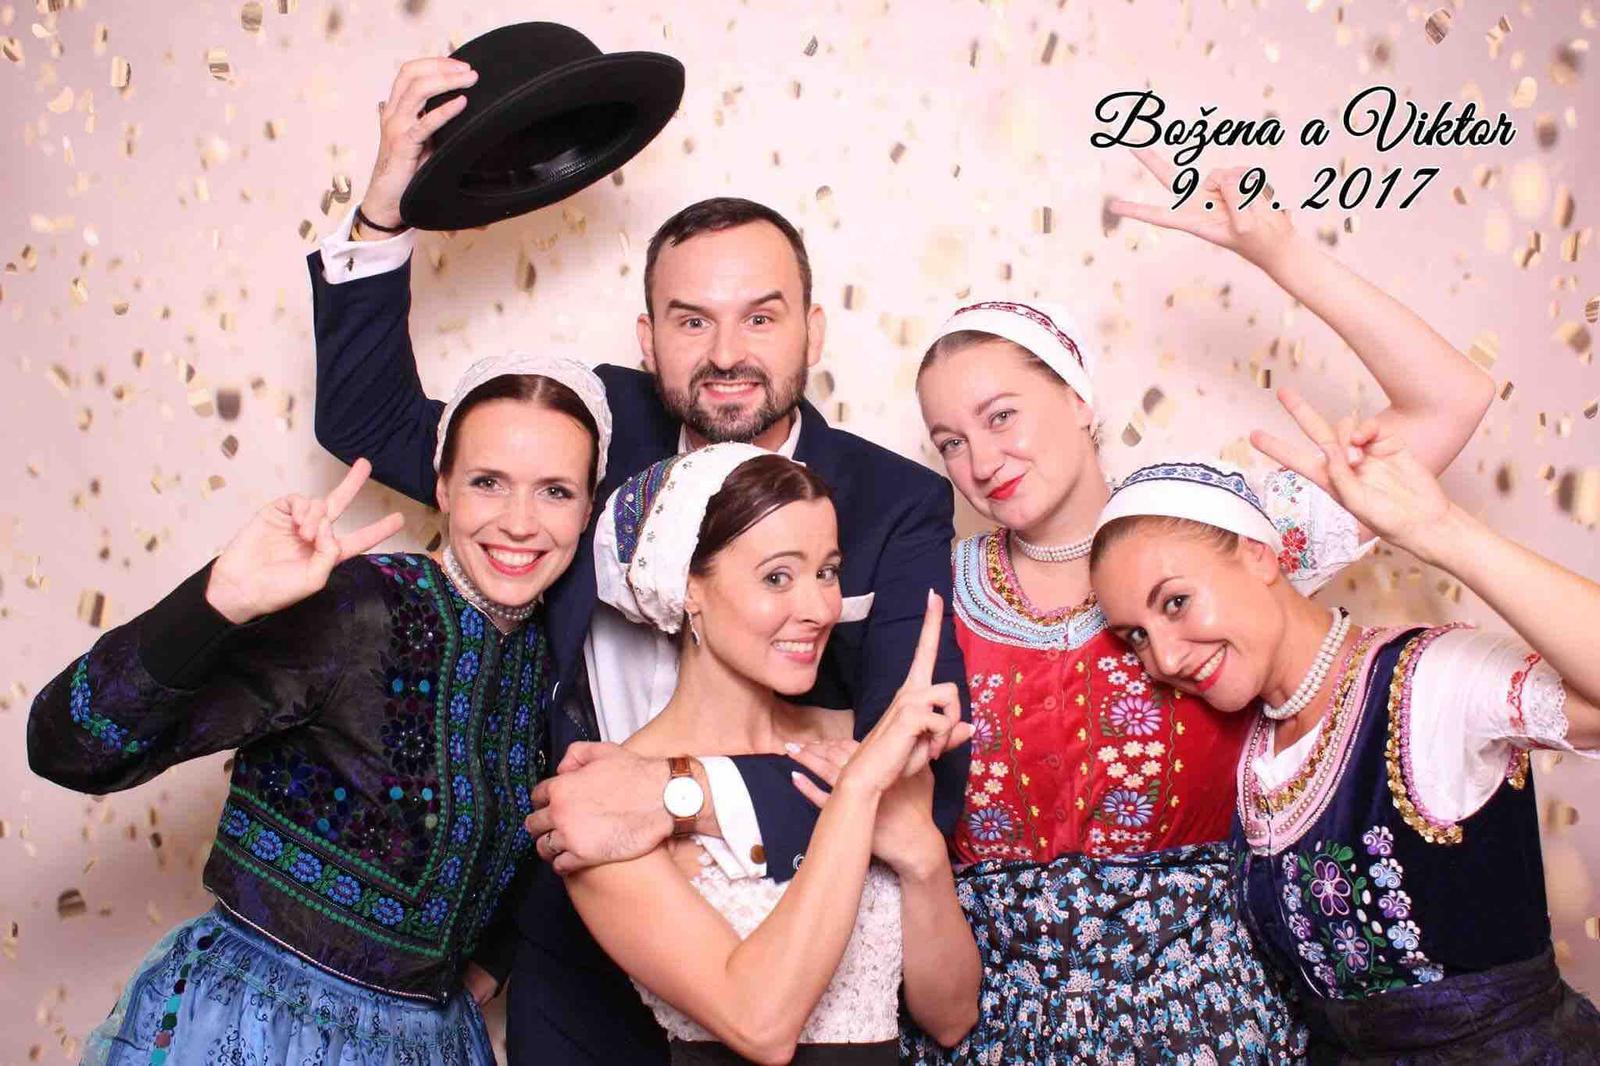 Božena Géčová a Viktor Tóth - Fun Face fotobox